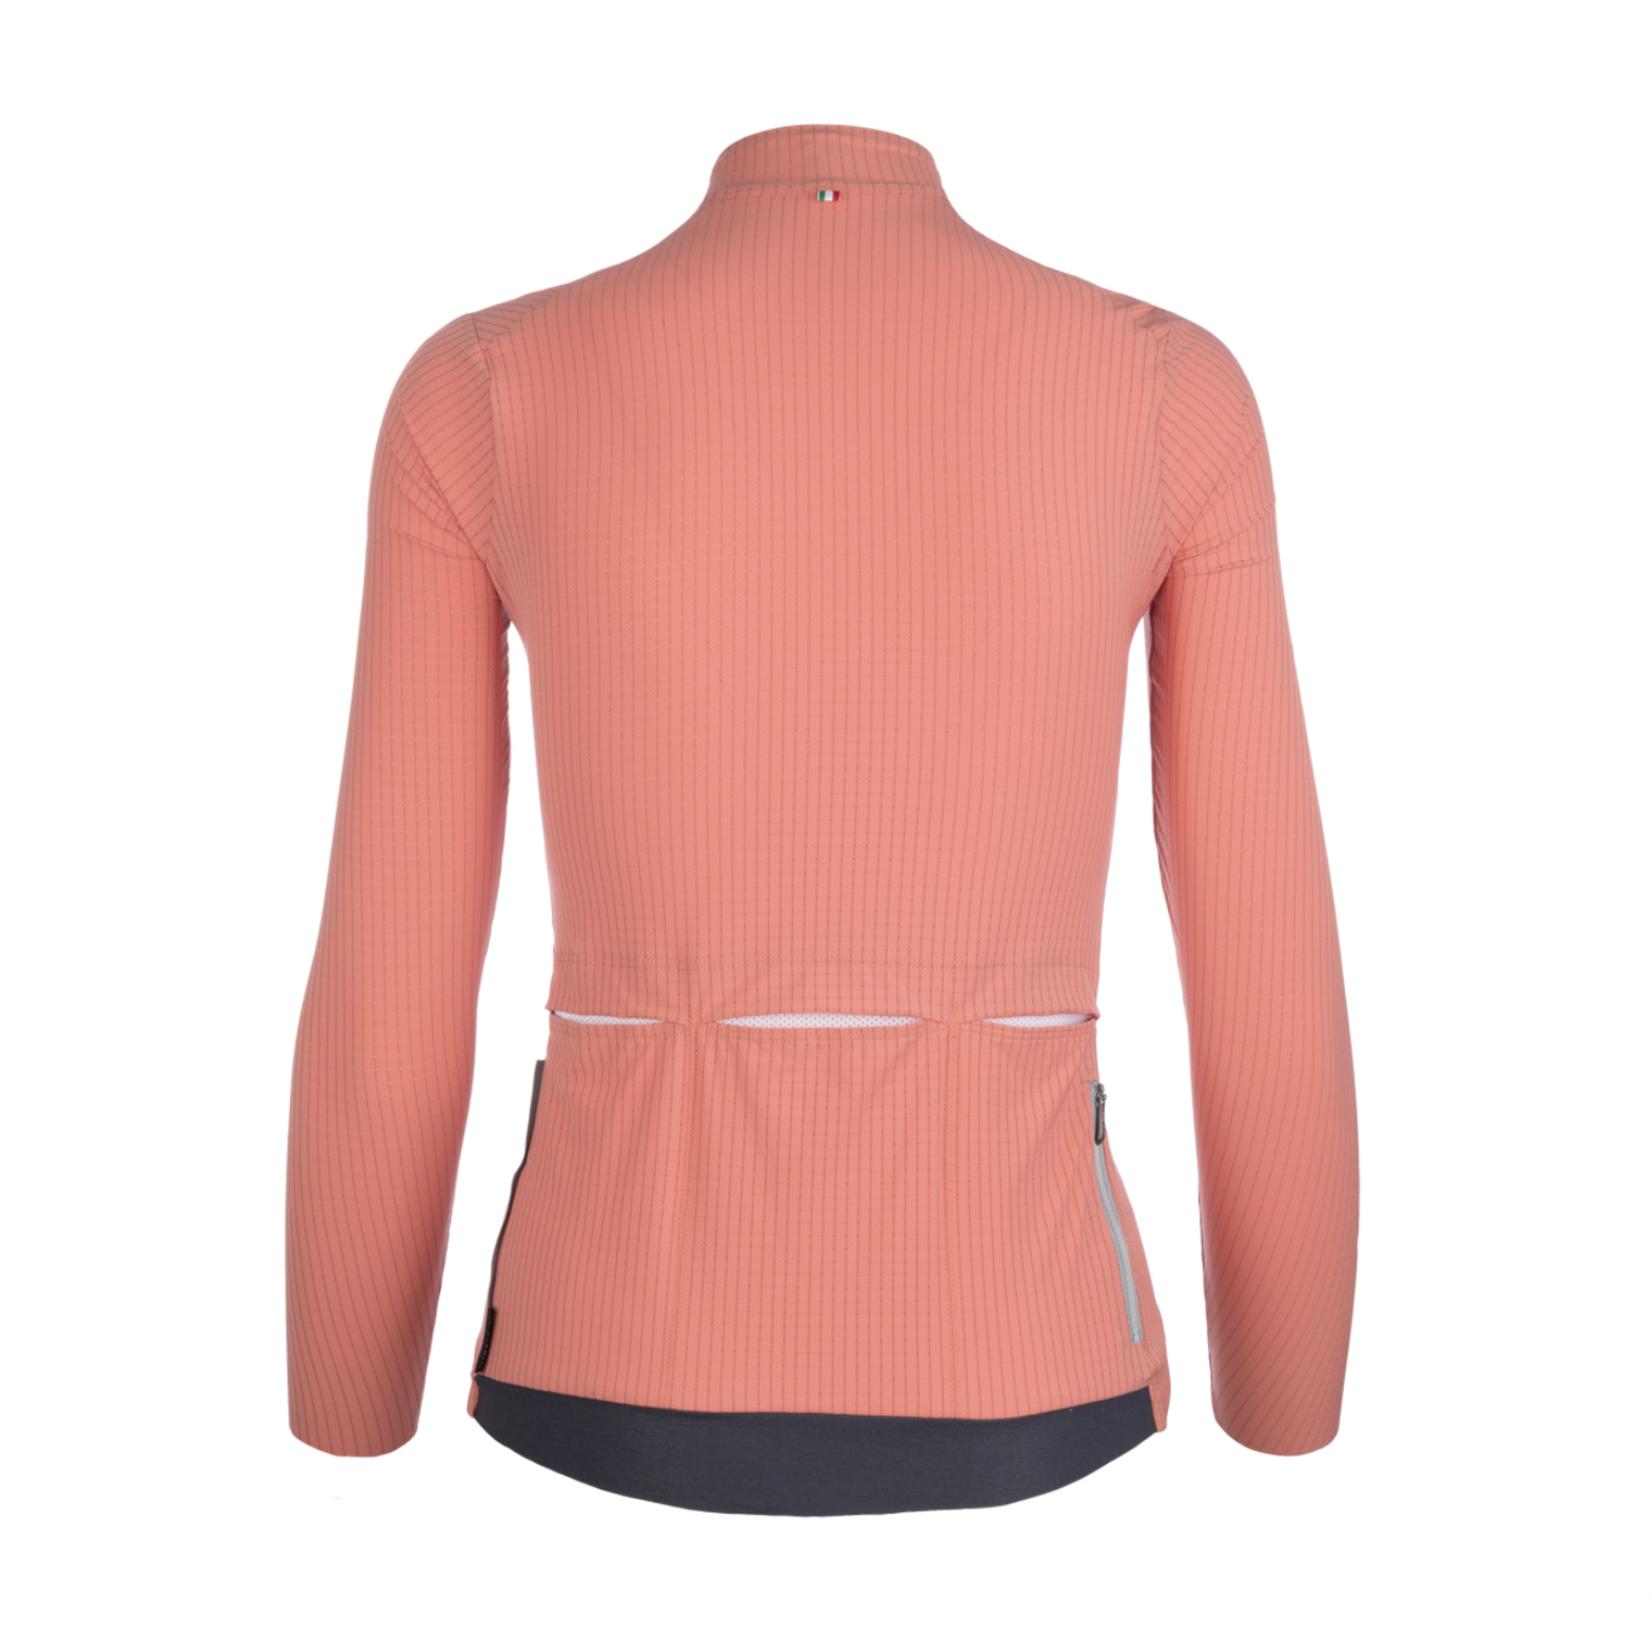 Q36.5 Q36.5 Women Long Sleeve Jersey L1 Pinstripe X - Rosa Antico